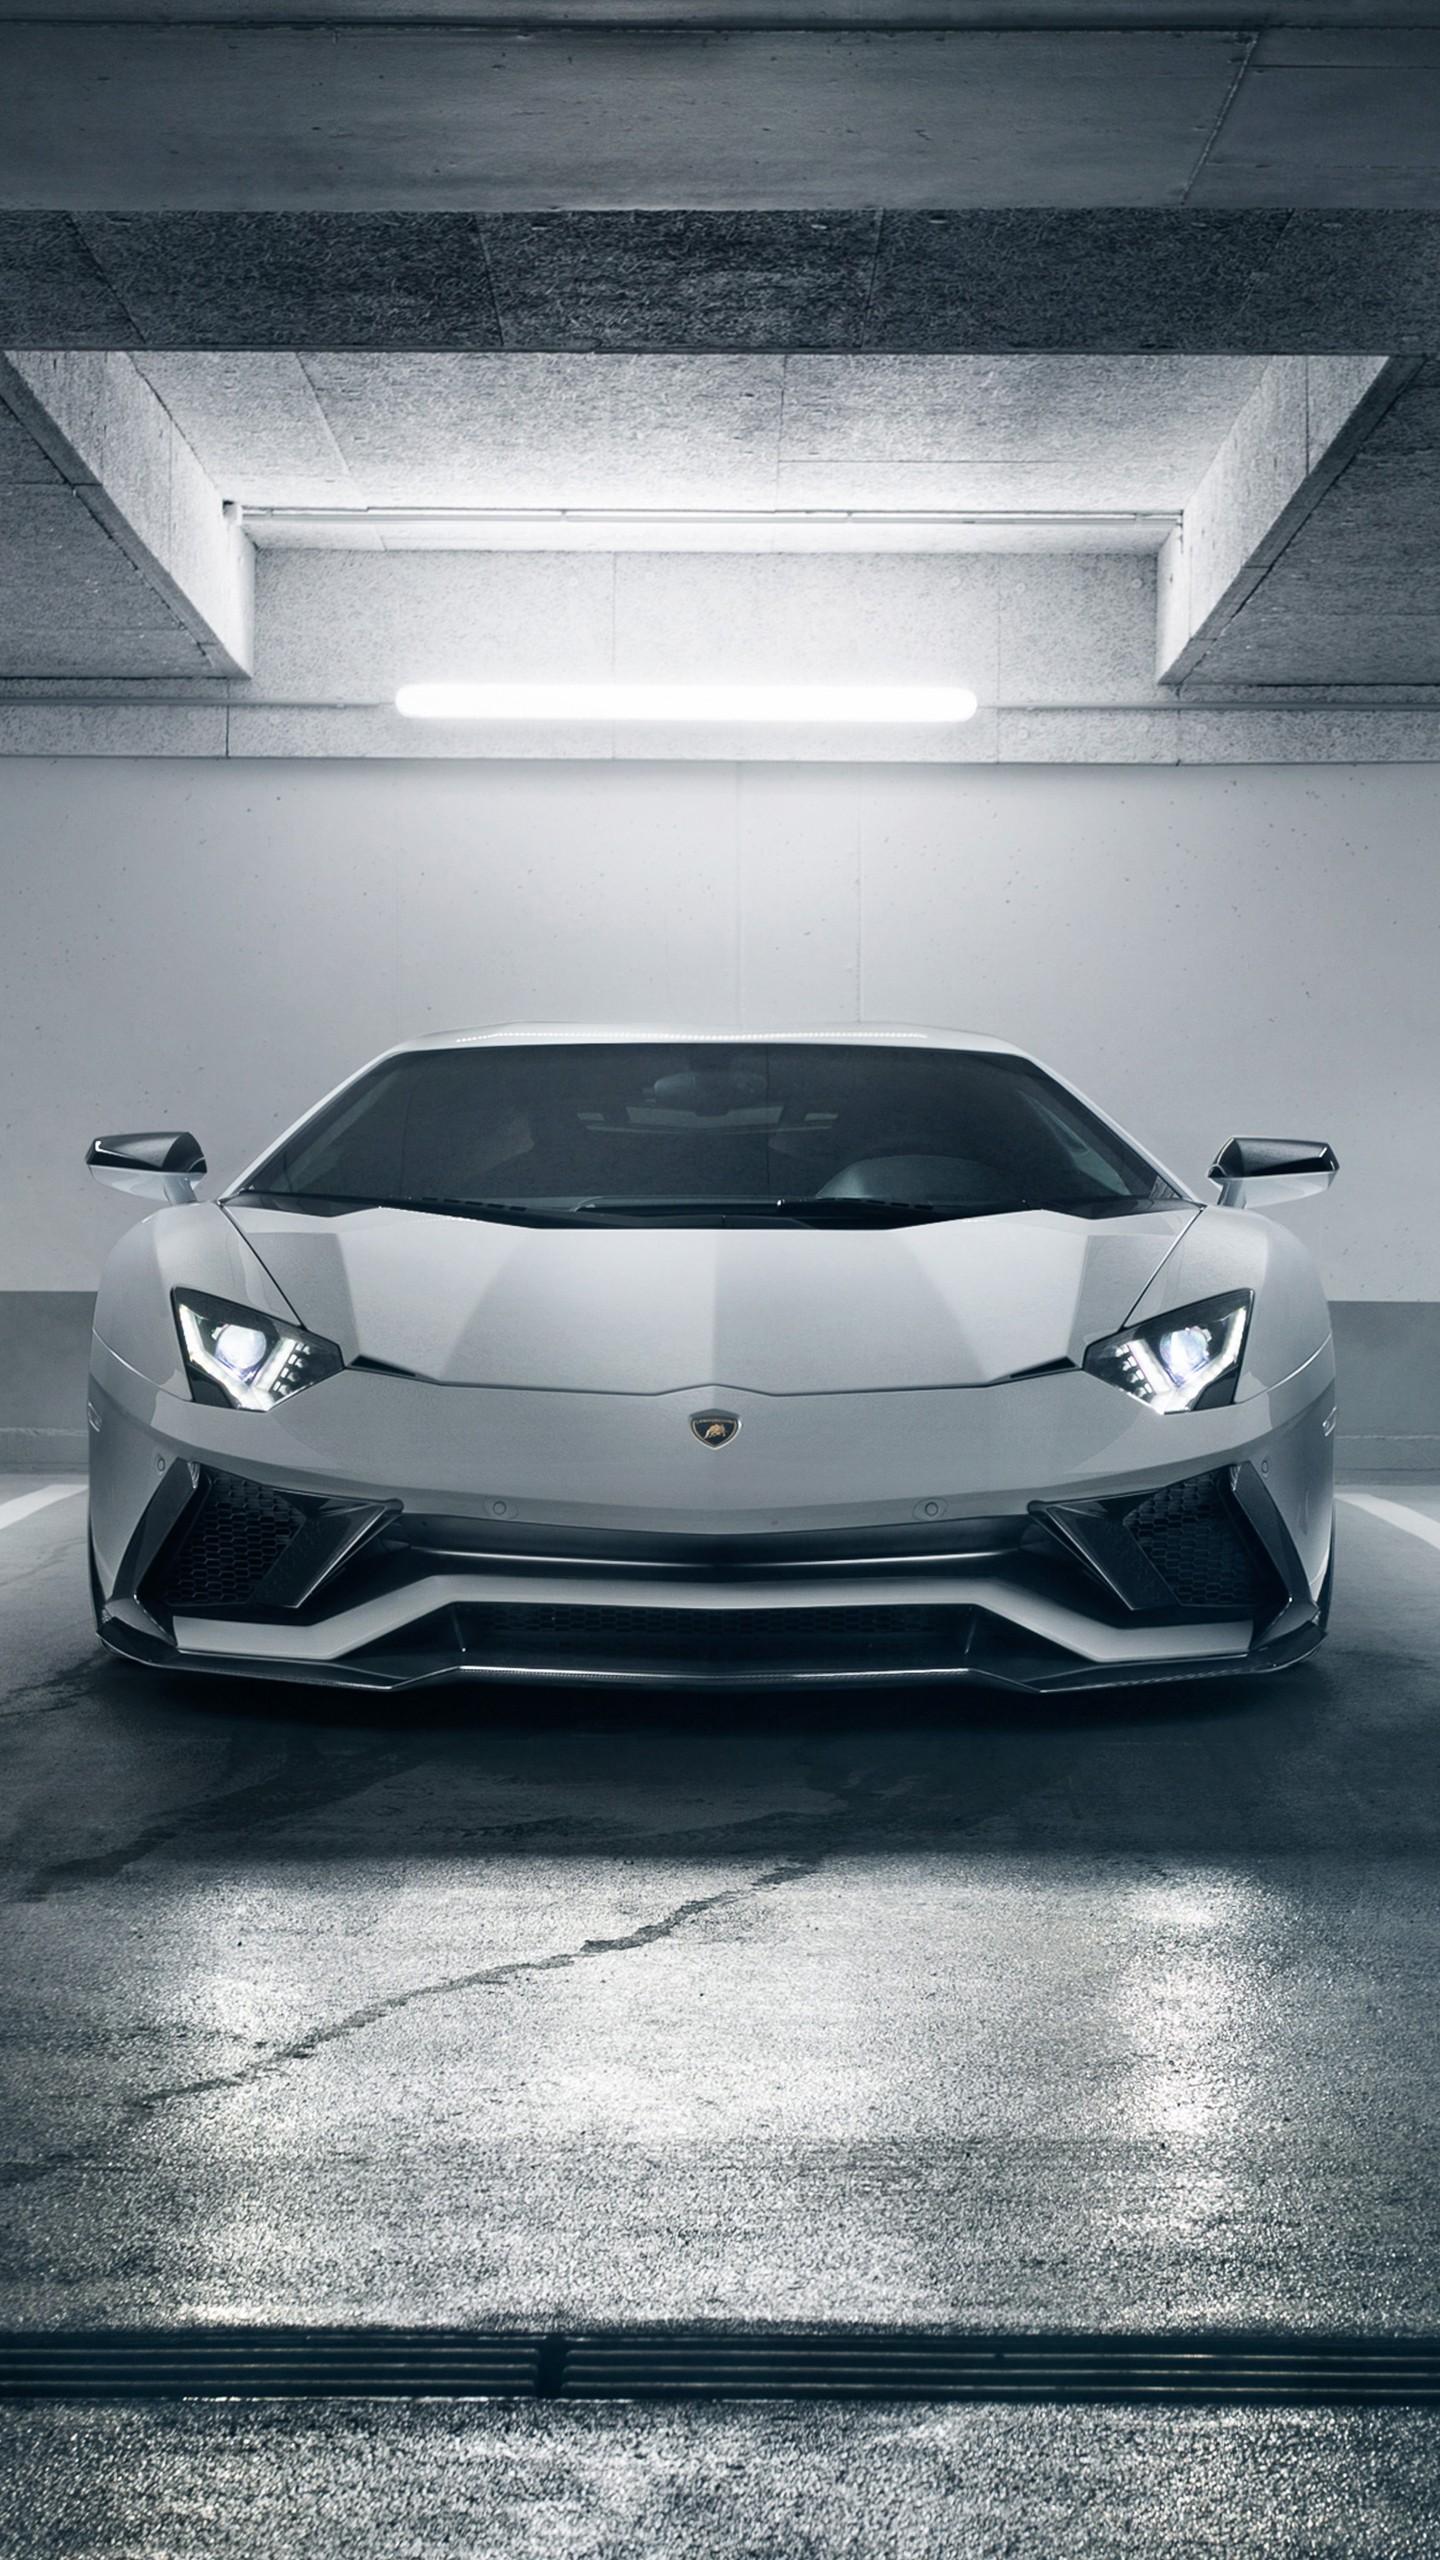 Lamborghini Aventador S 2018 4k Wallpapers